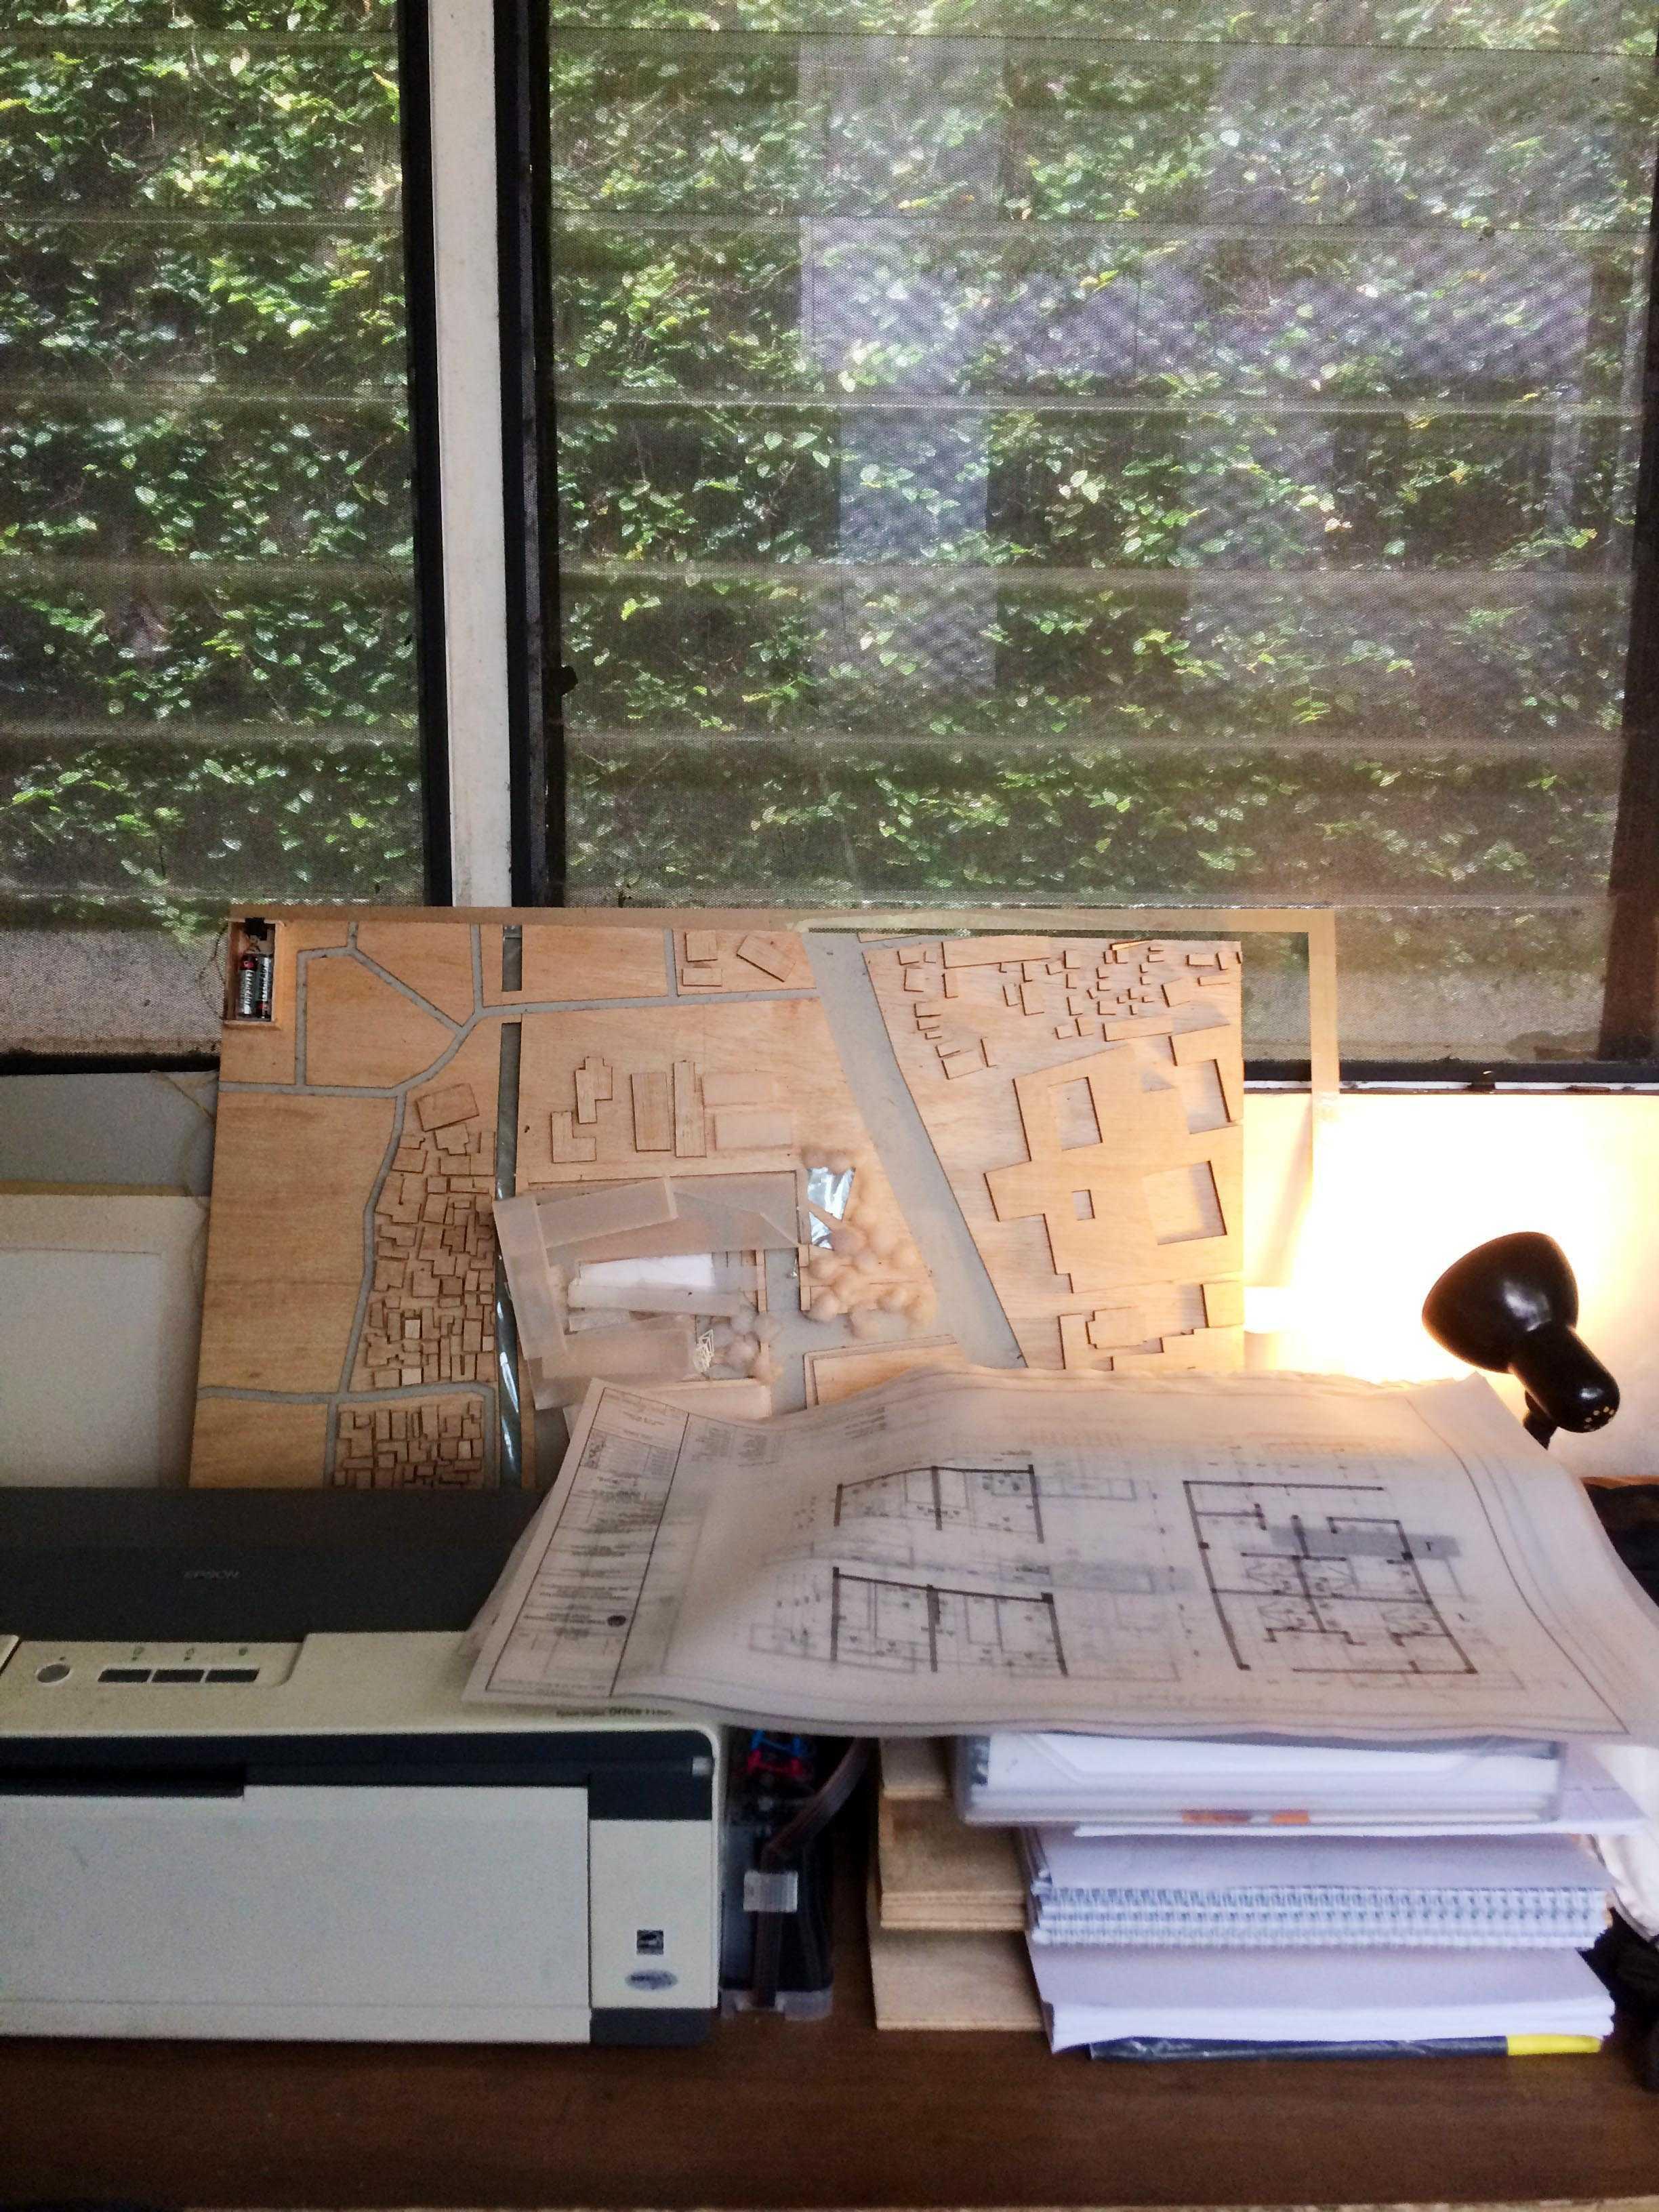 Monokroma Architect Monokroma Architect Office Lippo Karawaci Lippo Karawaci 11-Window Modern  23593